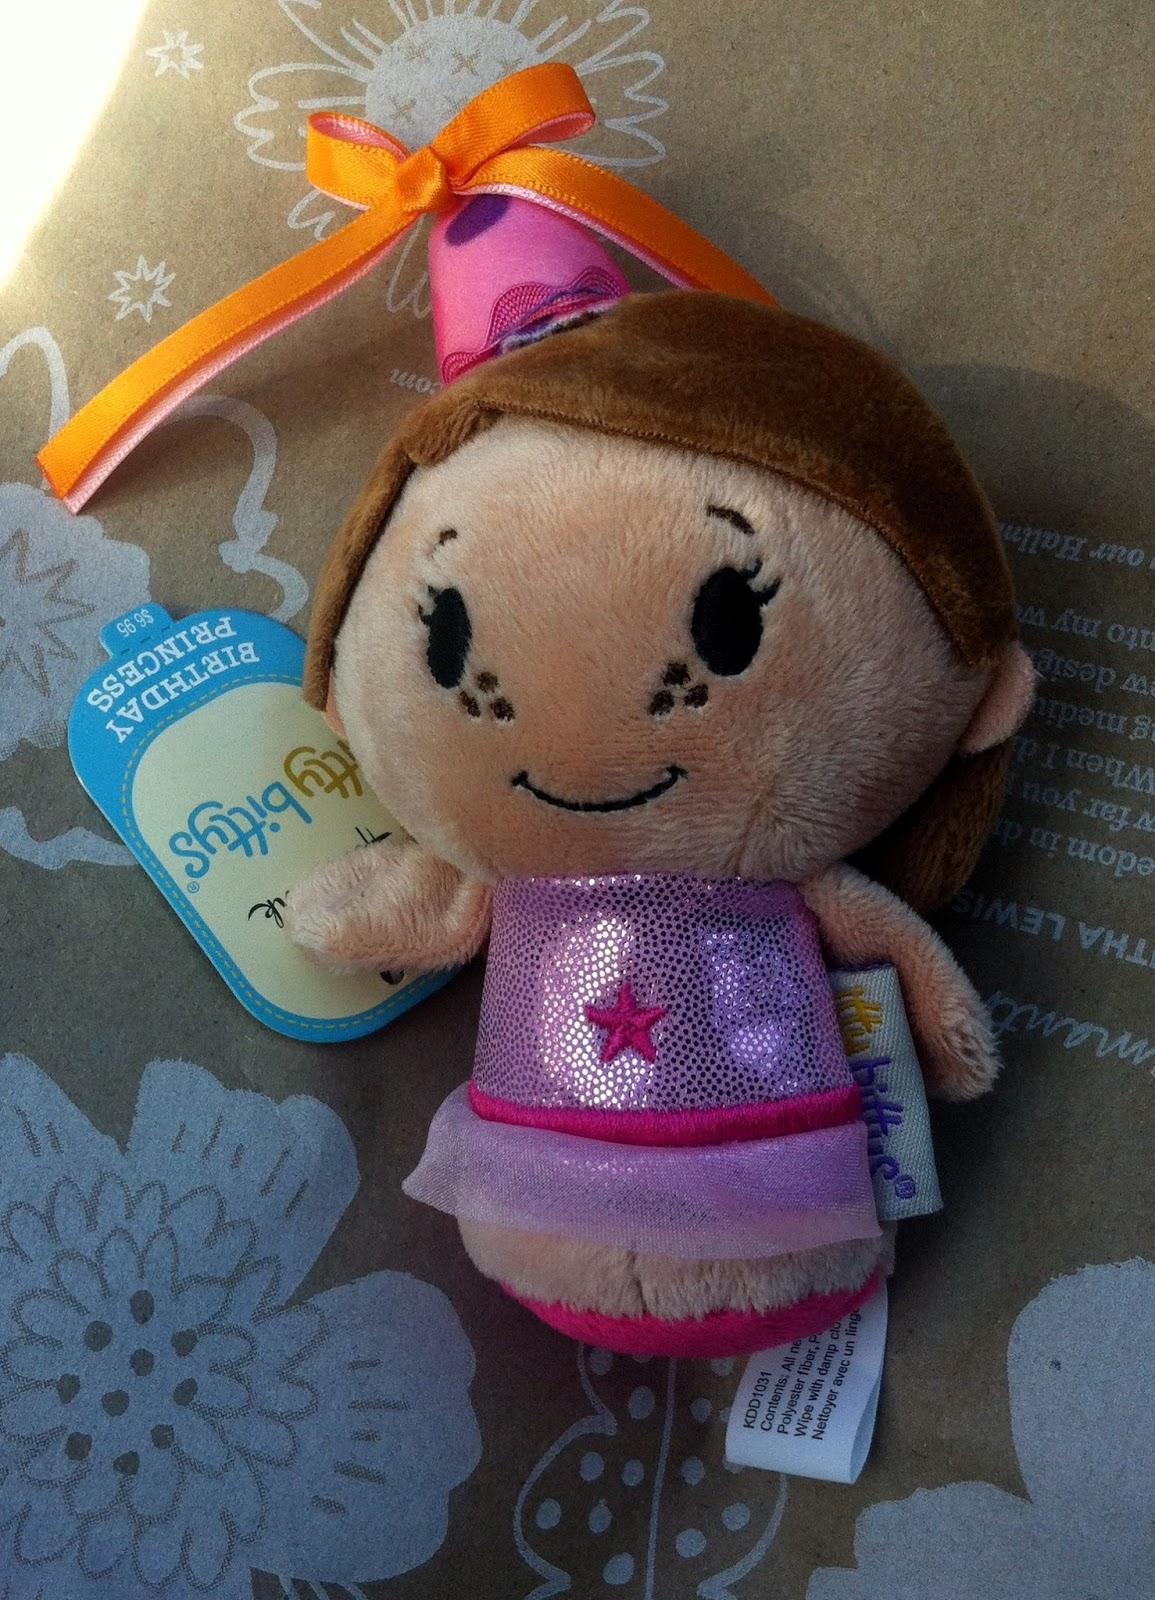 BIRTHDAY PRINCESS Girl Itty Bittys by Hallmark